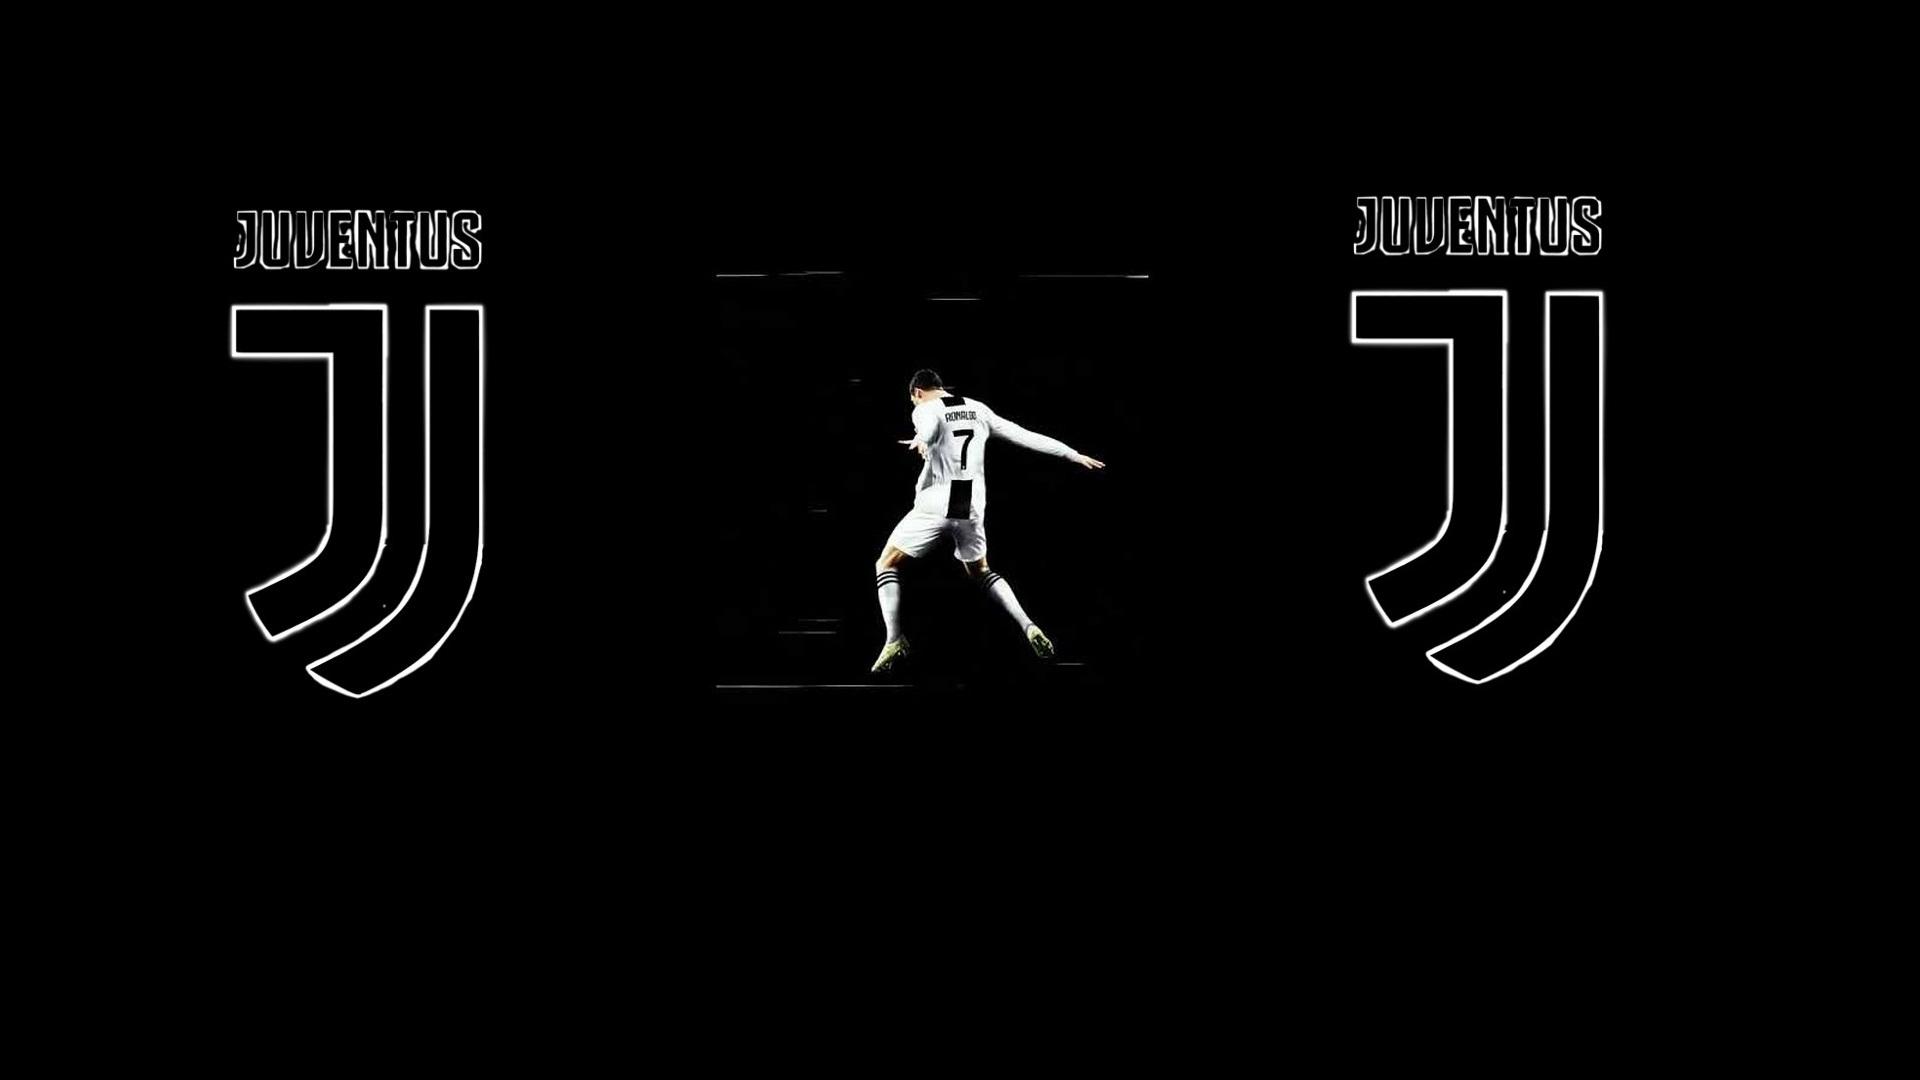 Cristiano Ronaldo Juventus Wallpaper For Desktop 2020 Cute 1920x1080